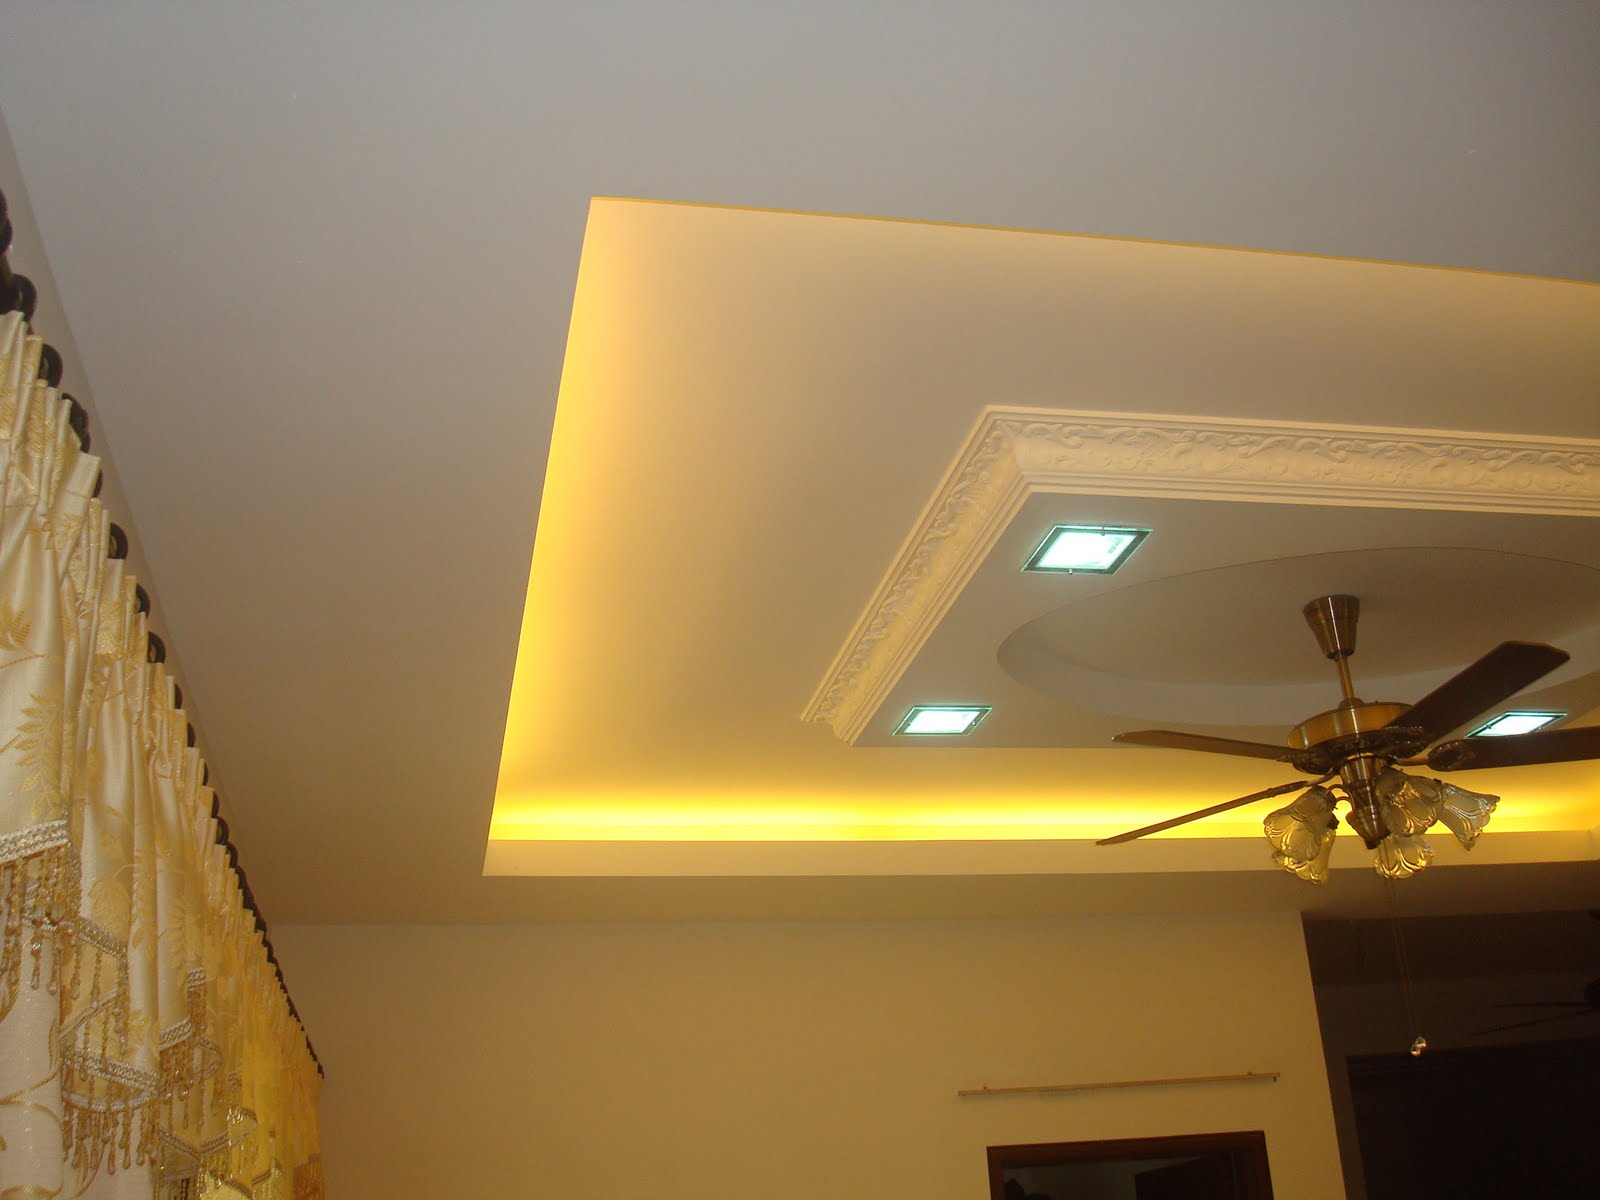 Hana Design & Construction: Plaster Ceiling